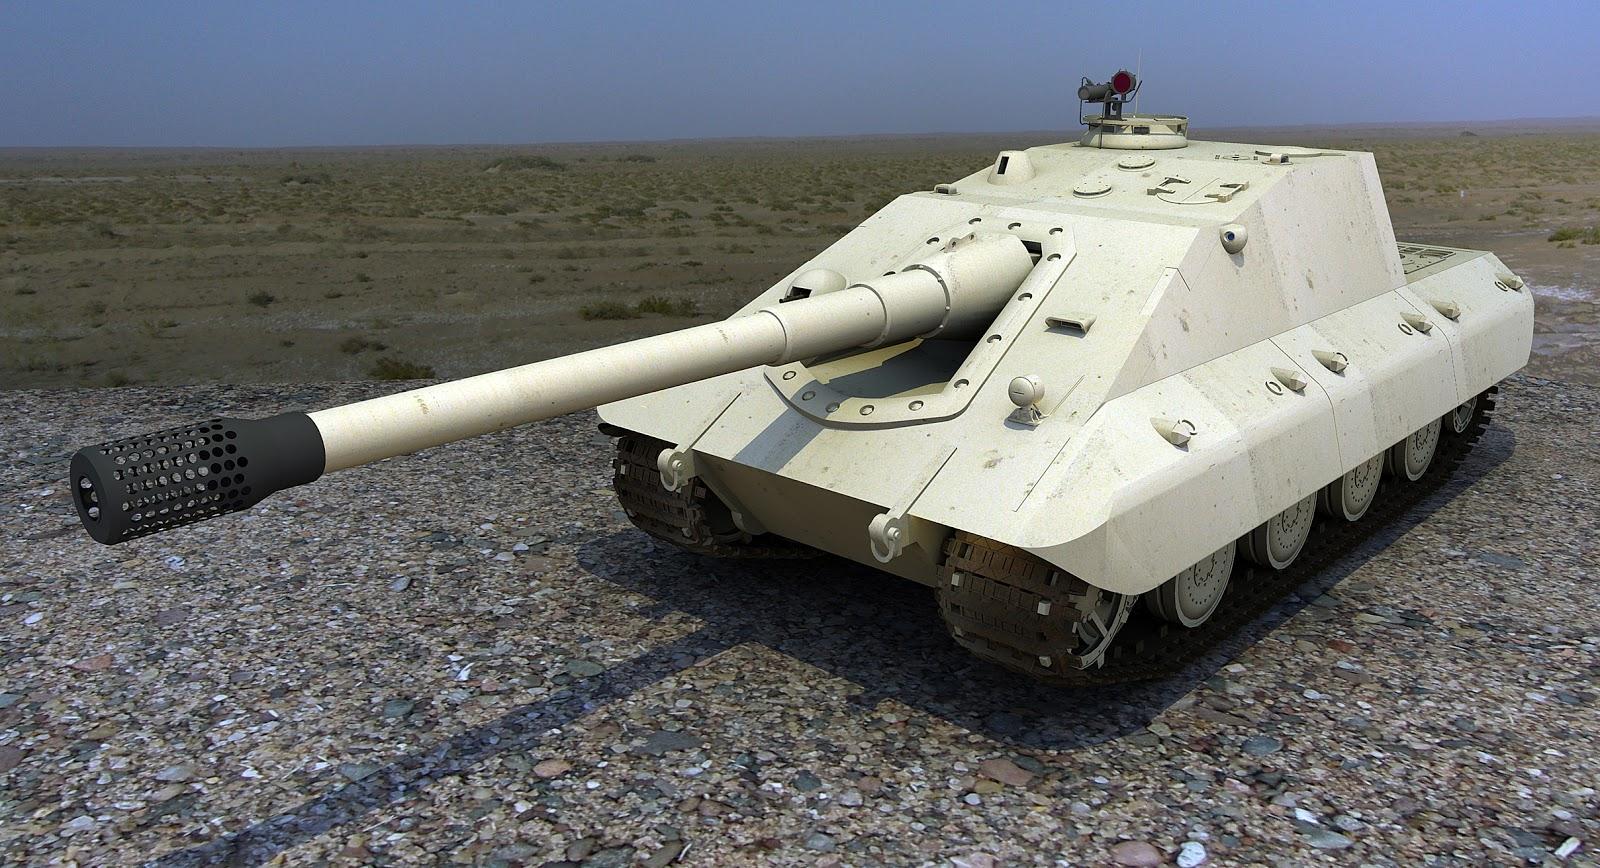 SketchUP Power 草圖力量: E100 JAGDPANZER 坦克殲擊車